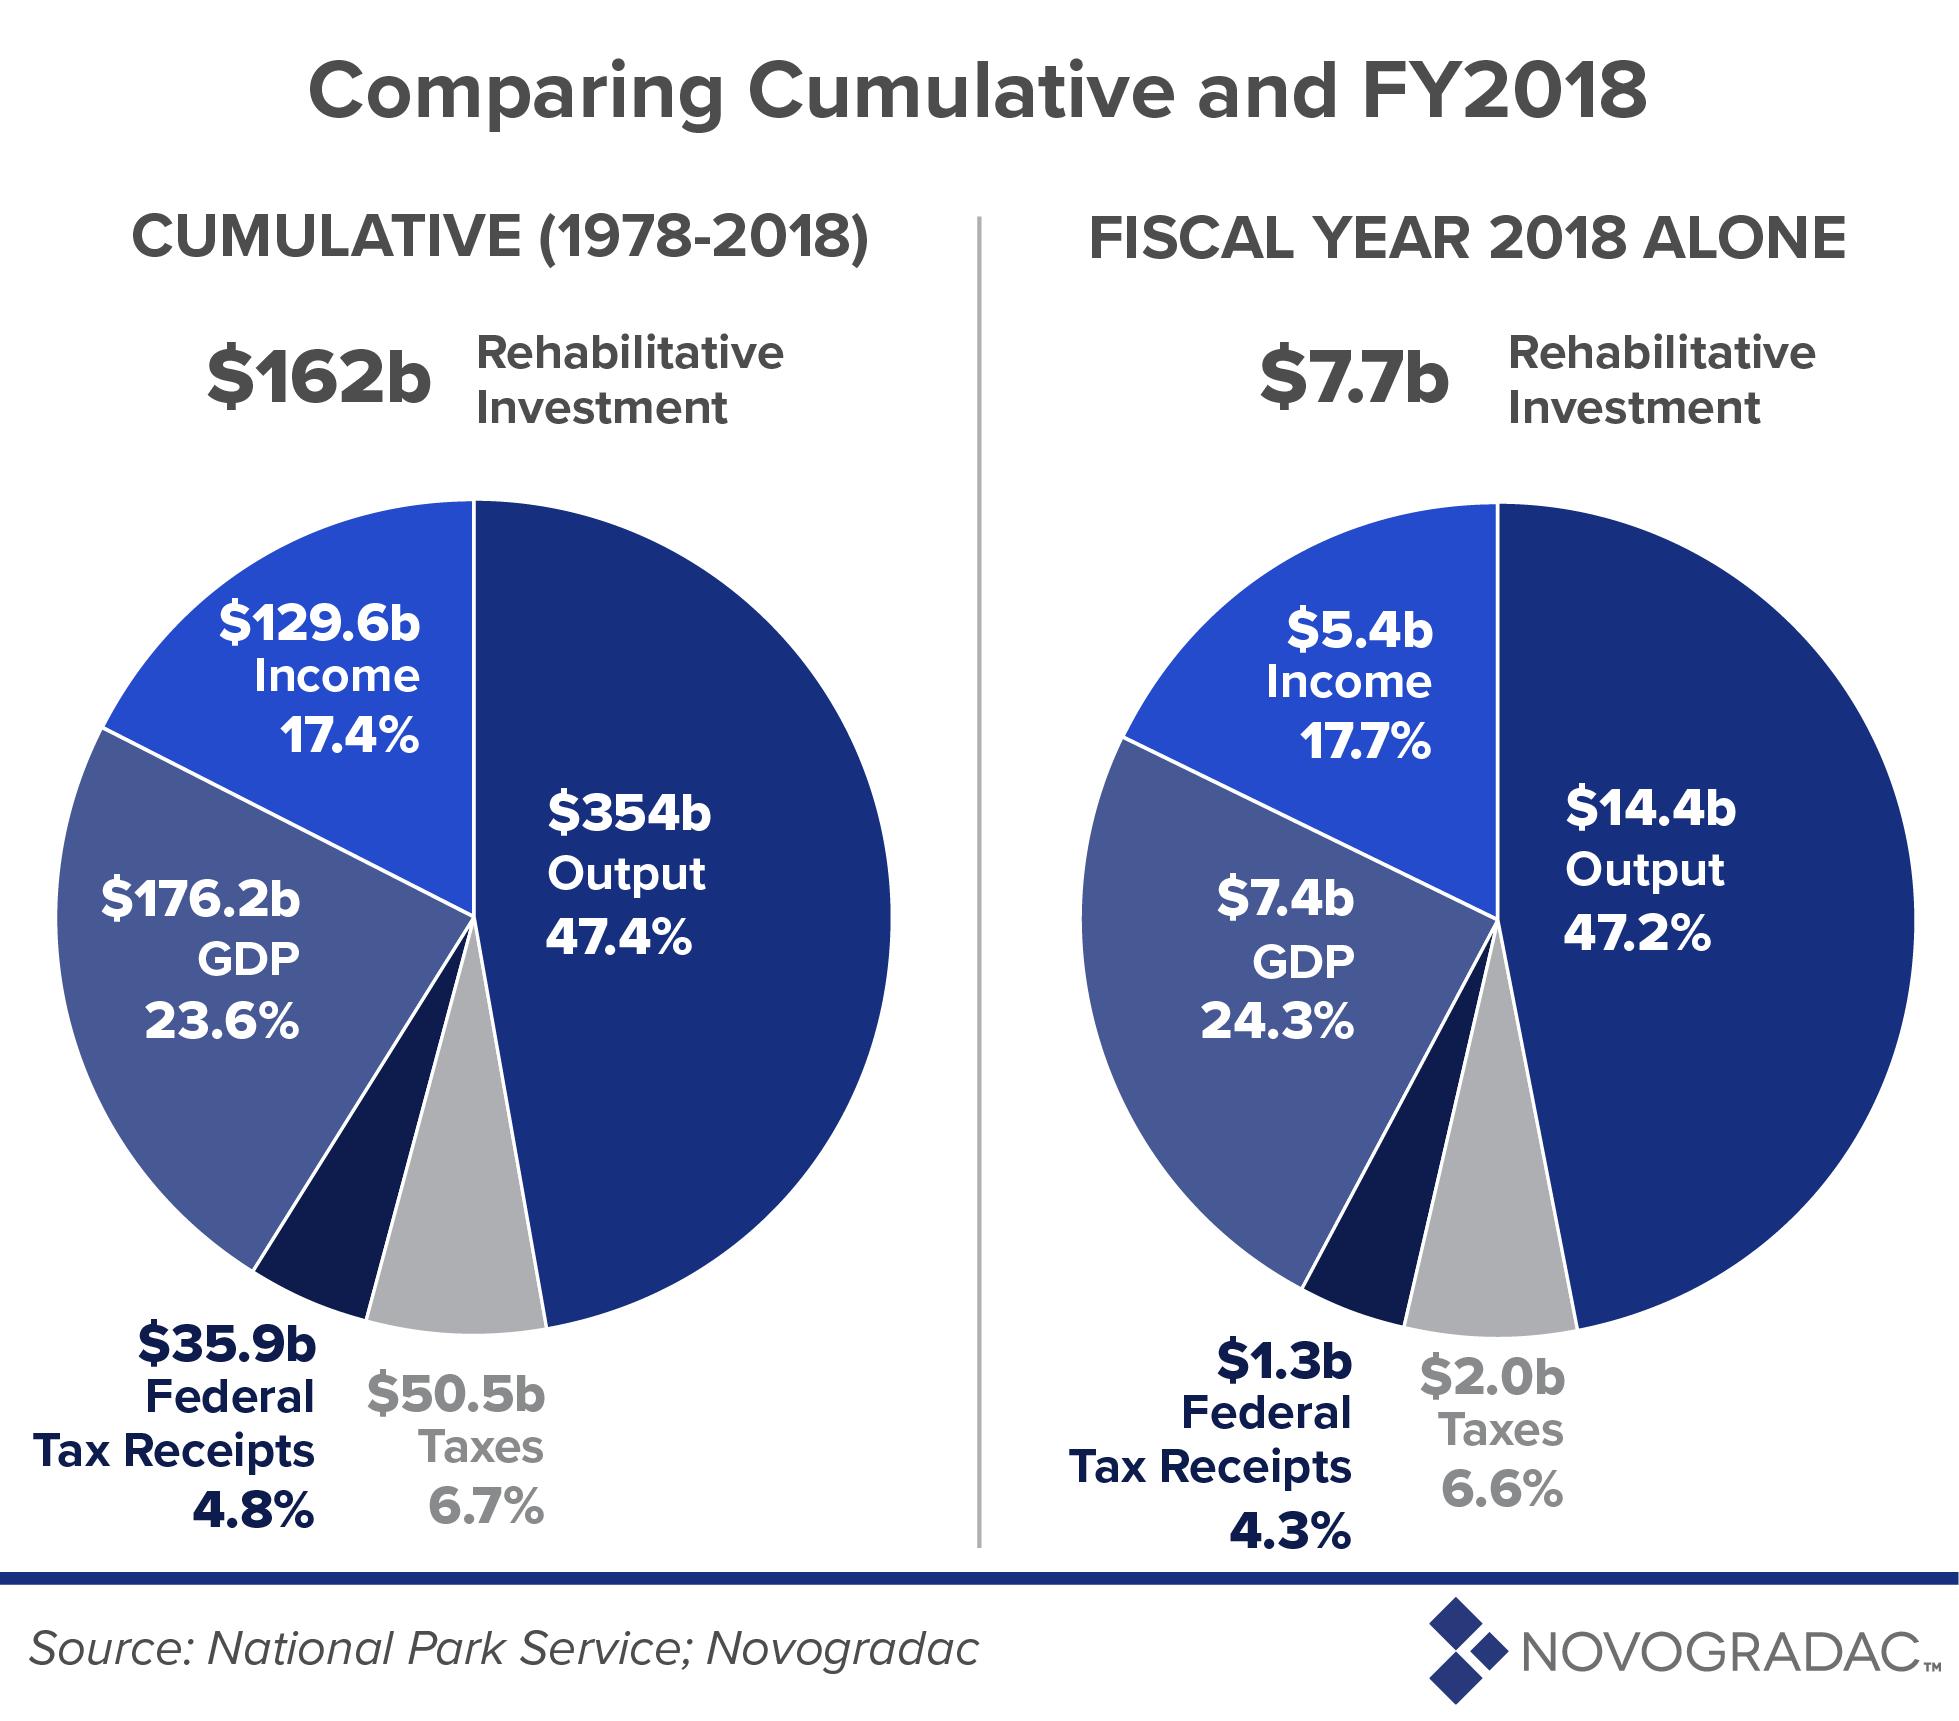 Comparing Cumulative and FY 2018 Image 2